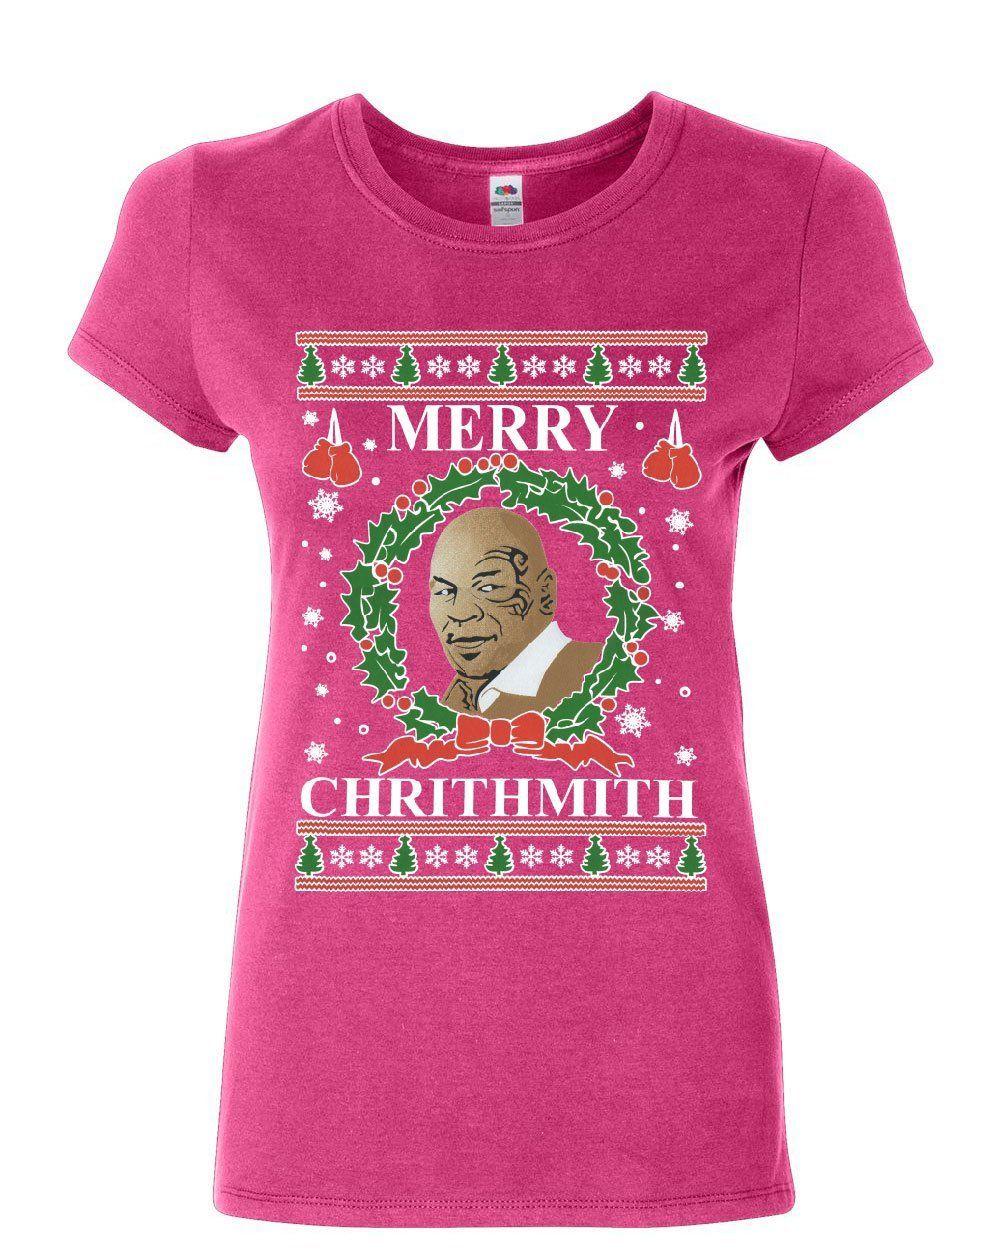 Merry Chrithmith Tyson Parody V-Neck T-Shirt Xmas Mike Boxer Ugly Tee